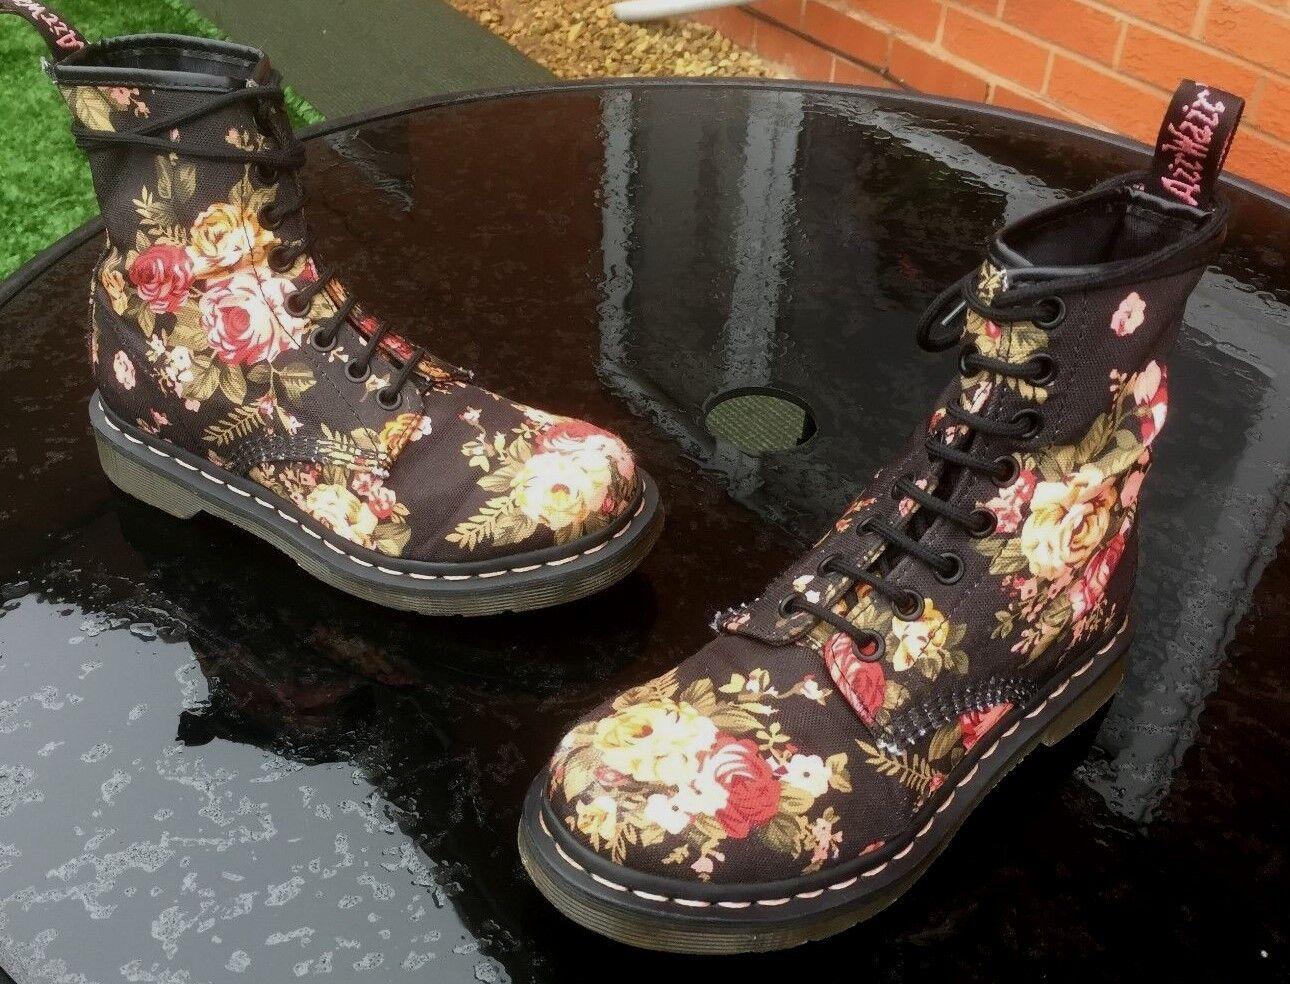 Dr Martens 1460 3 schwarz victorian flowers canvas Stiefel UK 3 1460 EU 36 163496